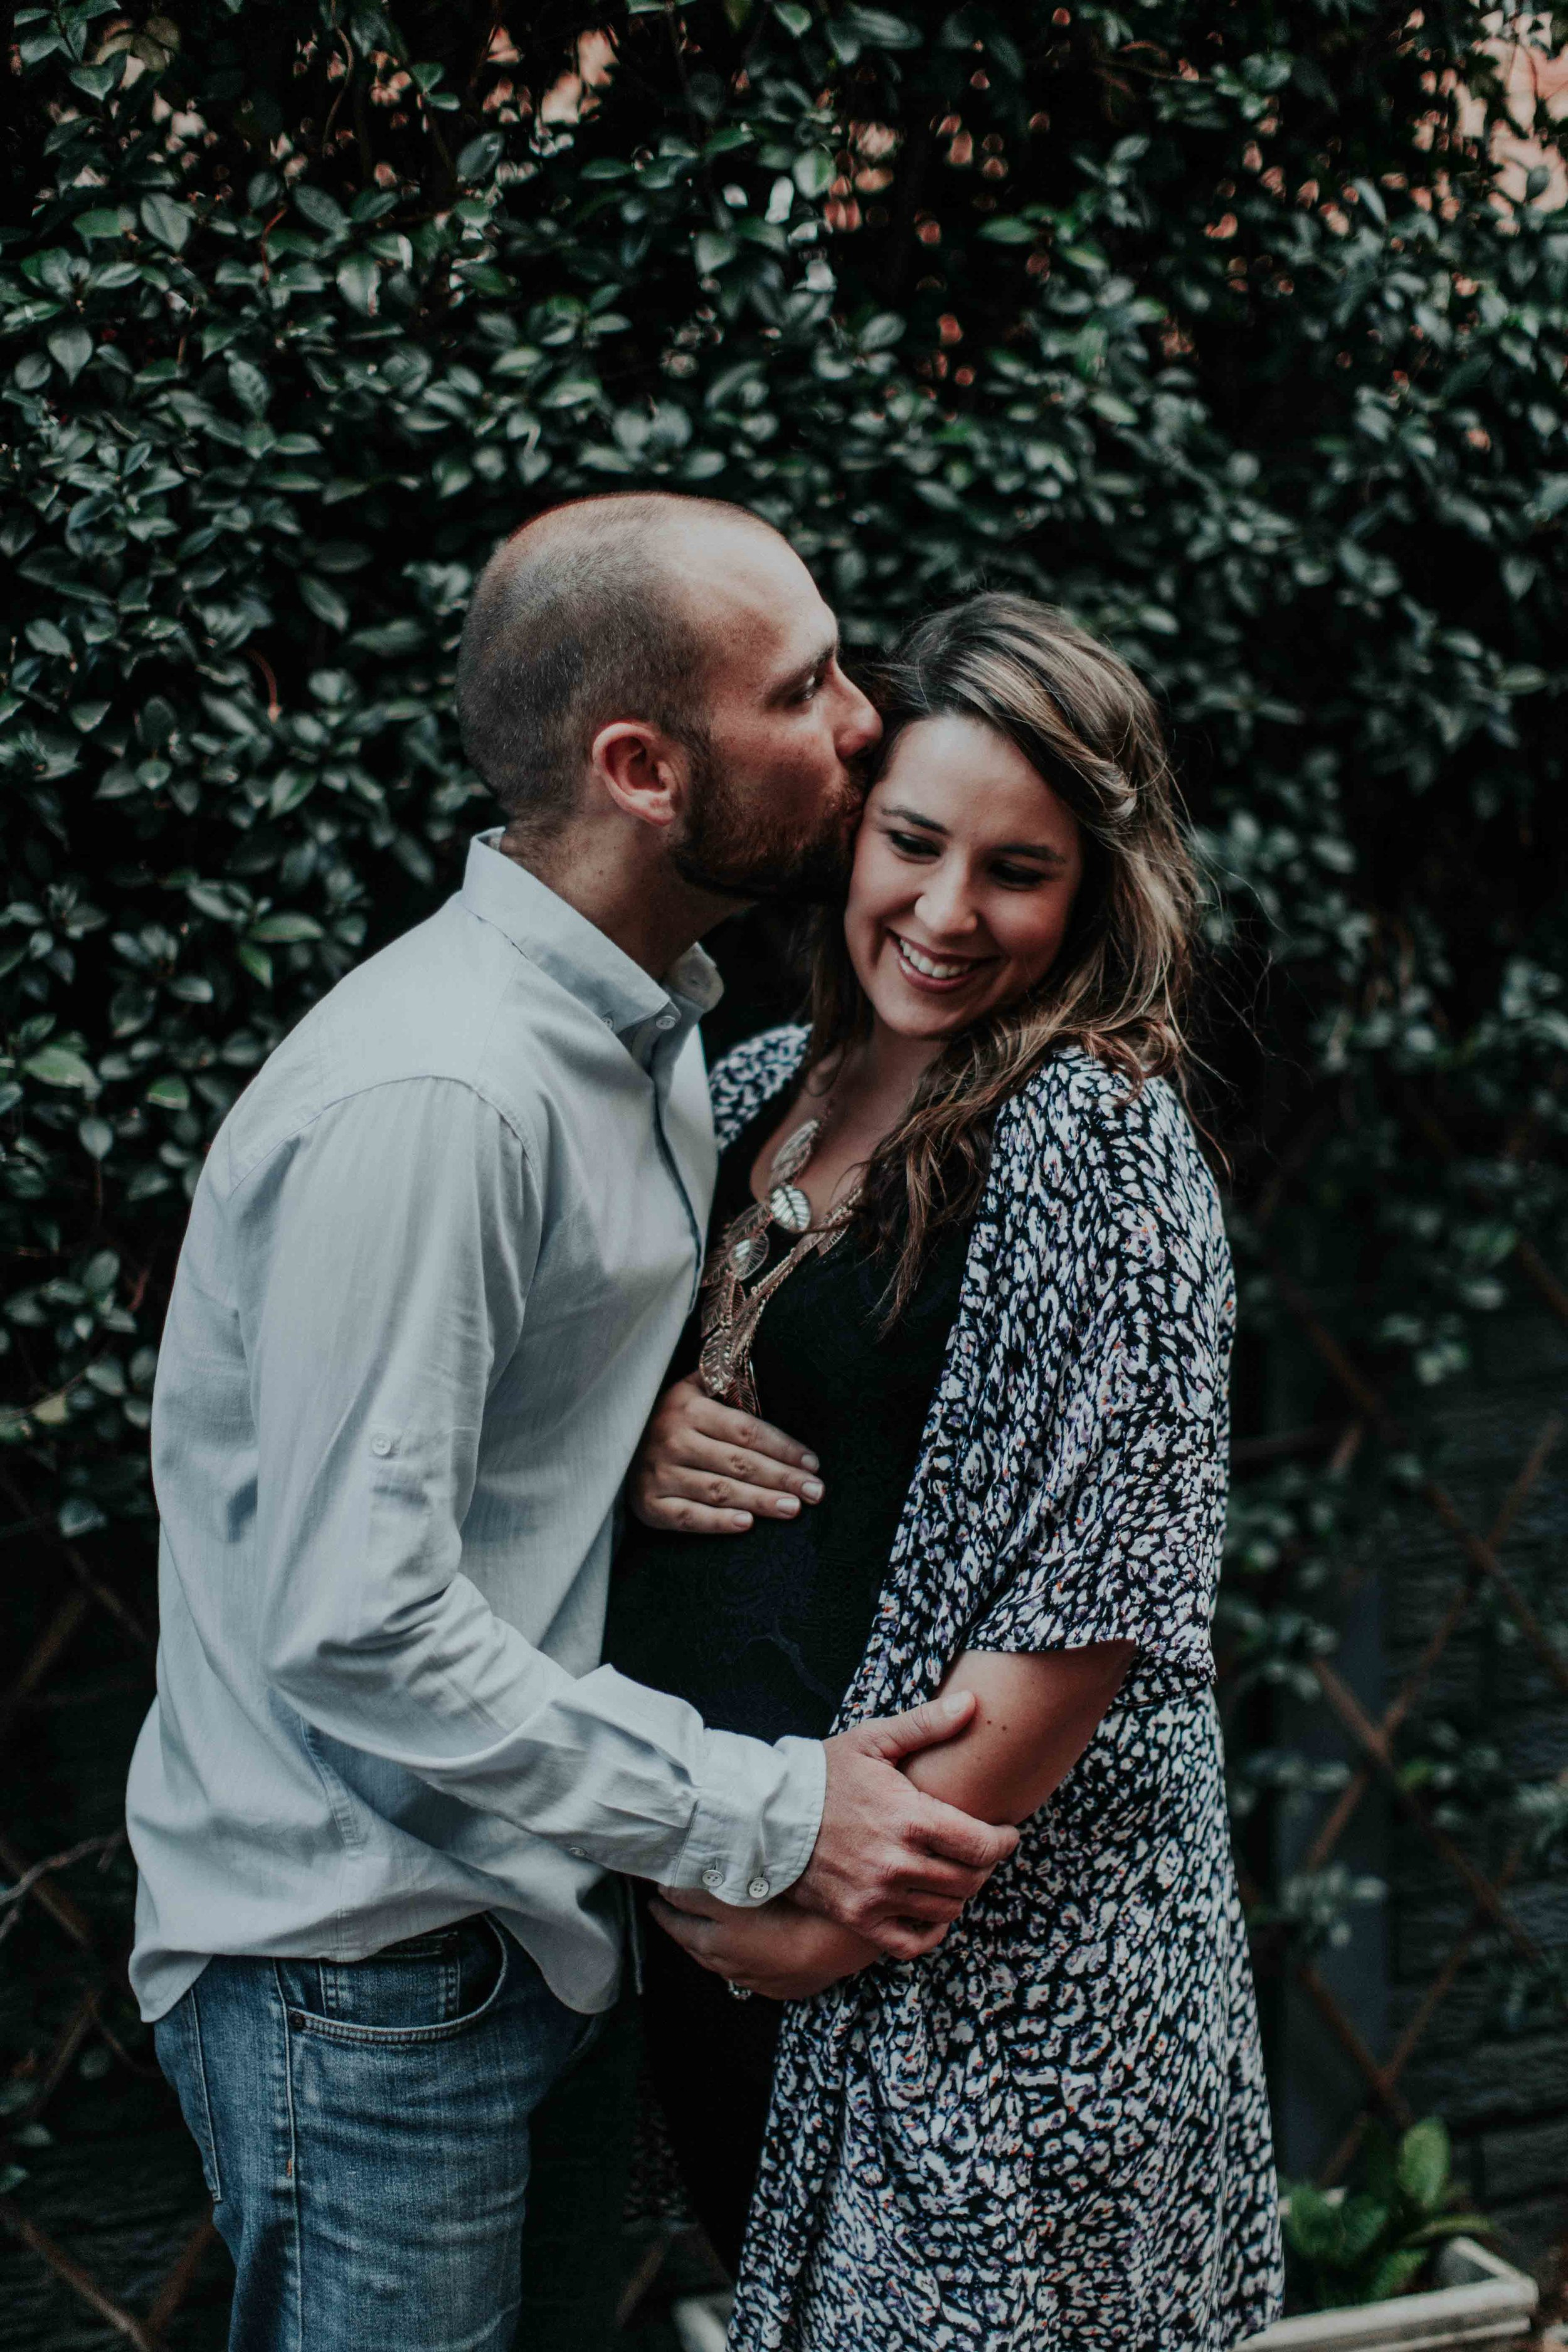 Kristi Smith Photography - Maternity Shoot -  Glenn & Kirsten 4.jpg